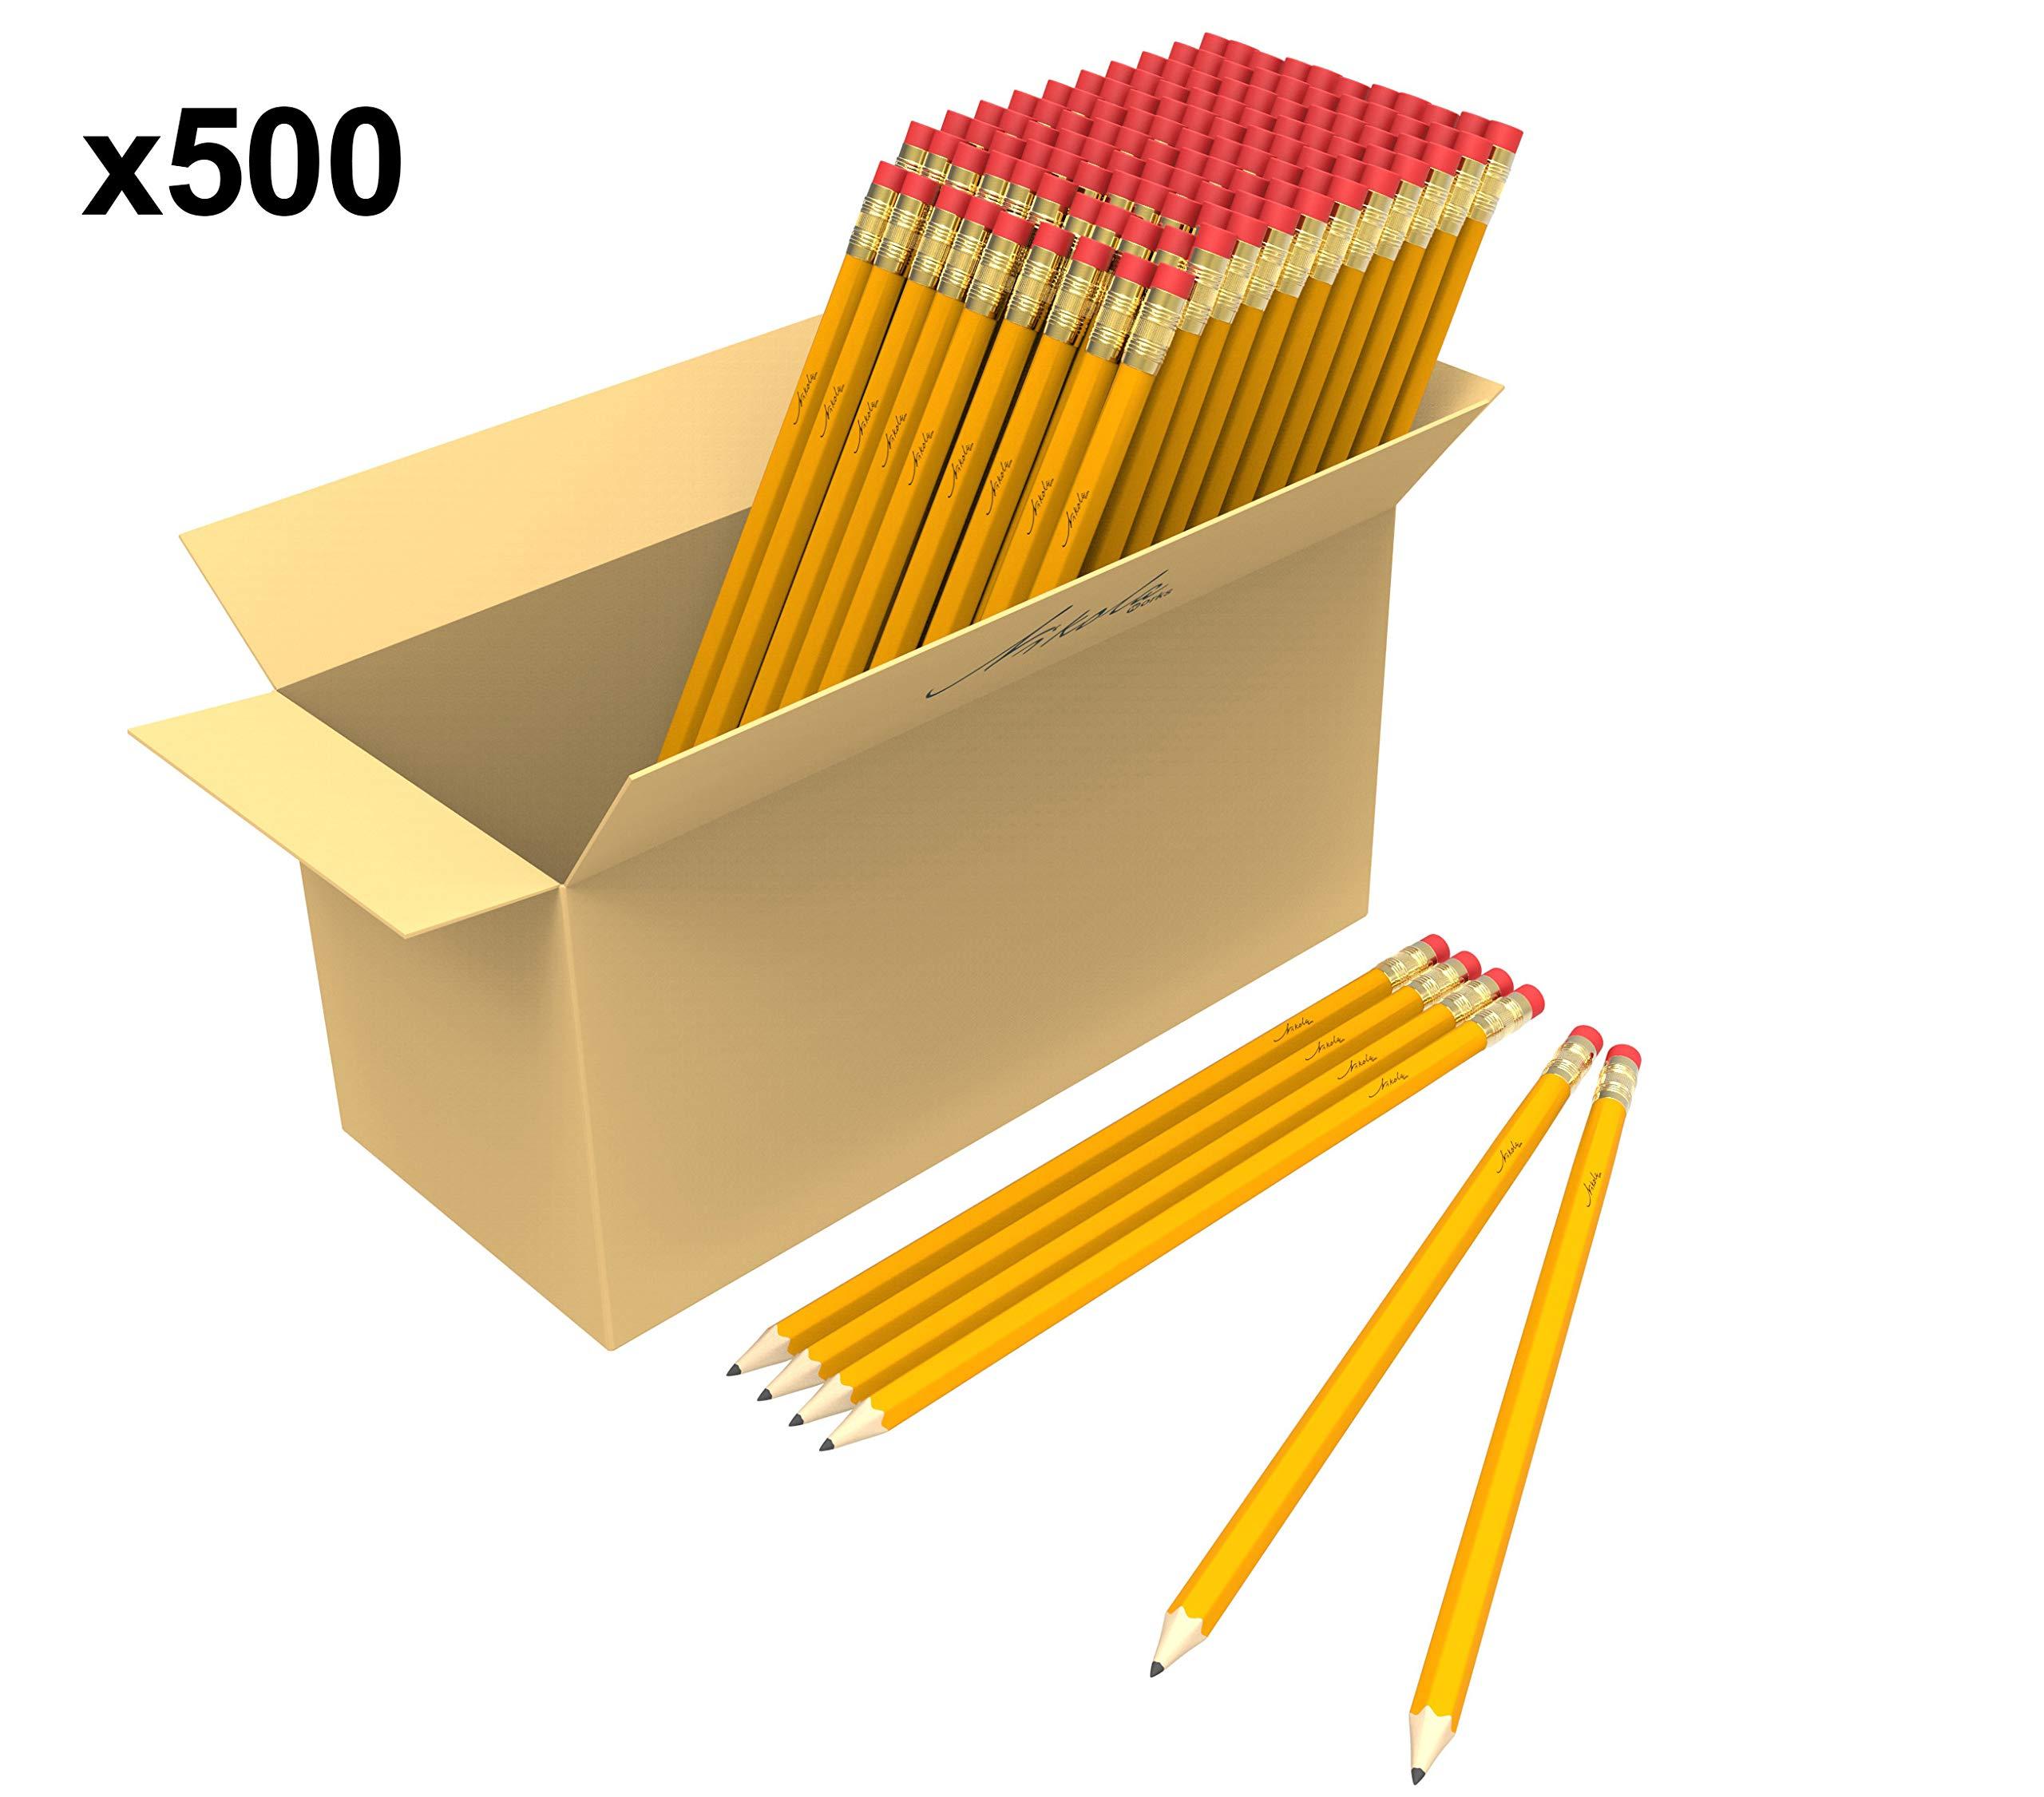 Bulk Premium Pre-Sharpened Wood Cased #2 HB Pencils 500 Pack by Nikola Works